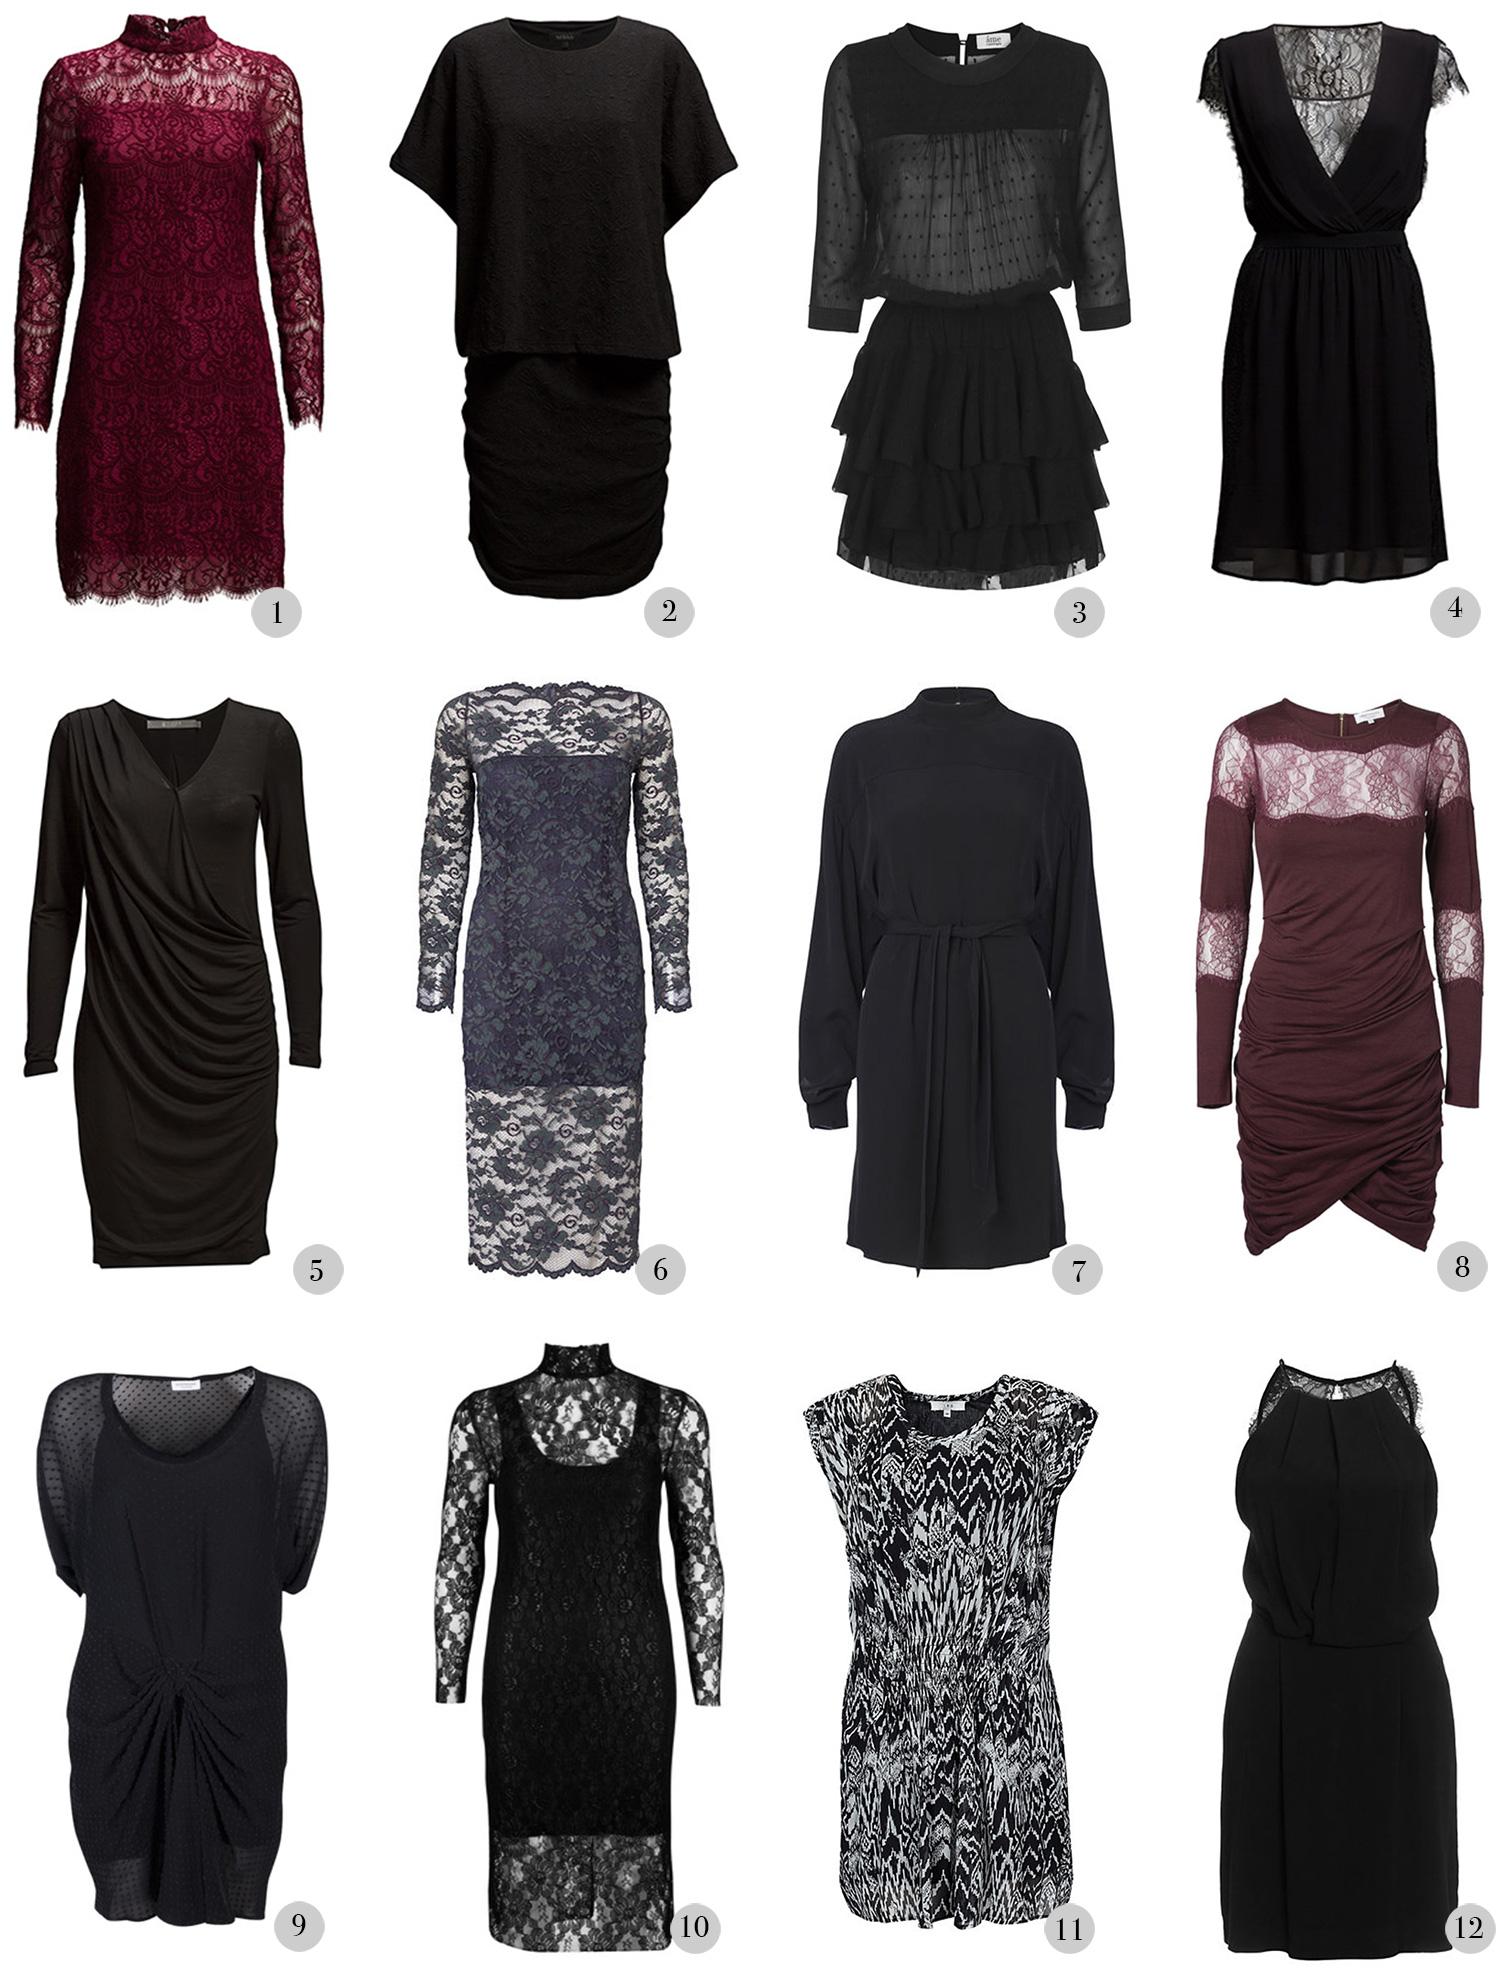 20d6a2b8890a Christmas party dresses - Christina Dueholm